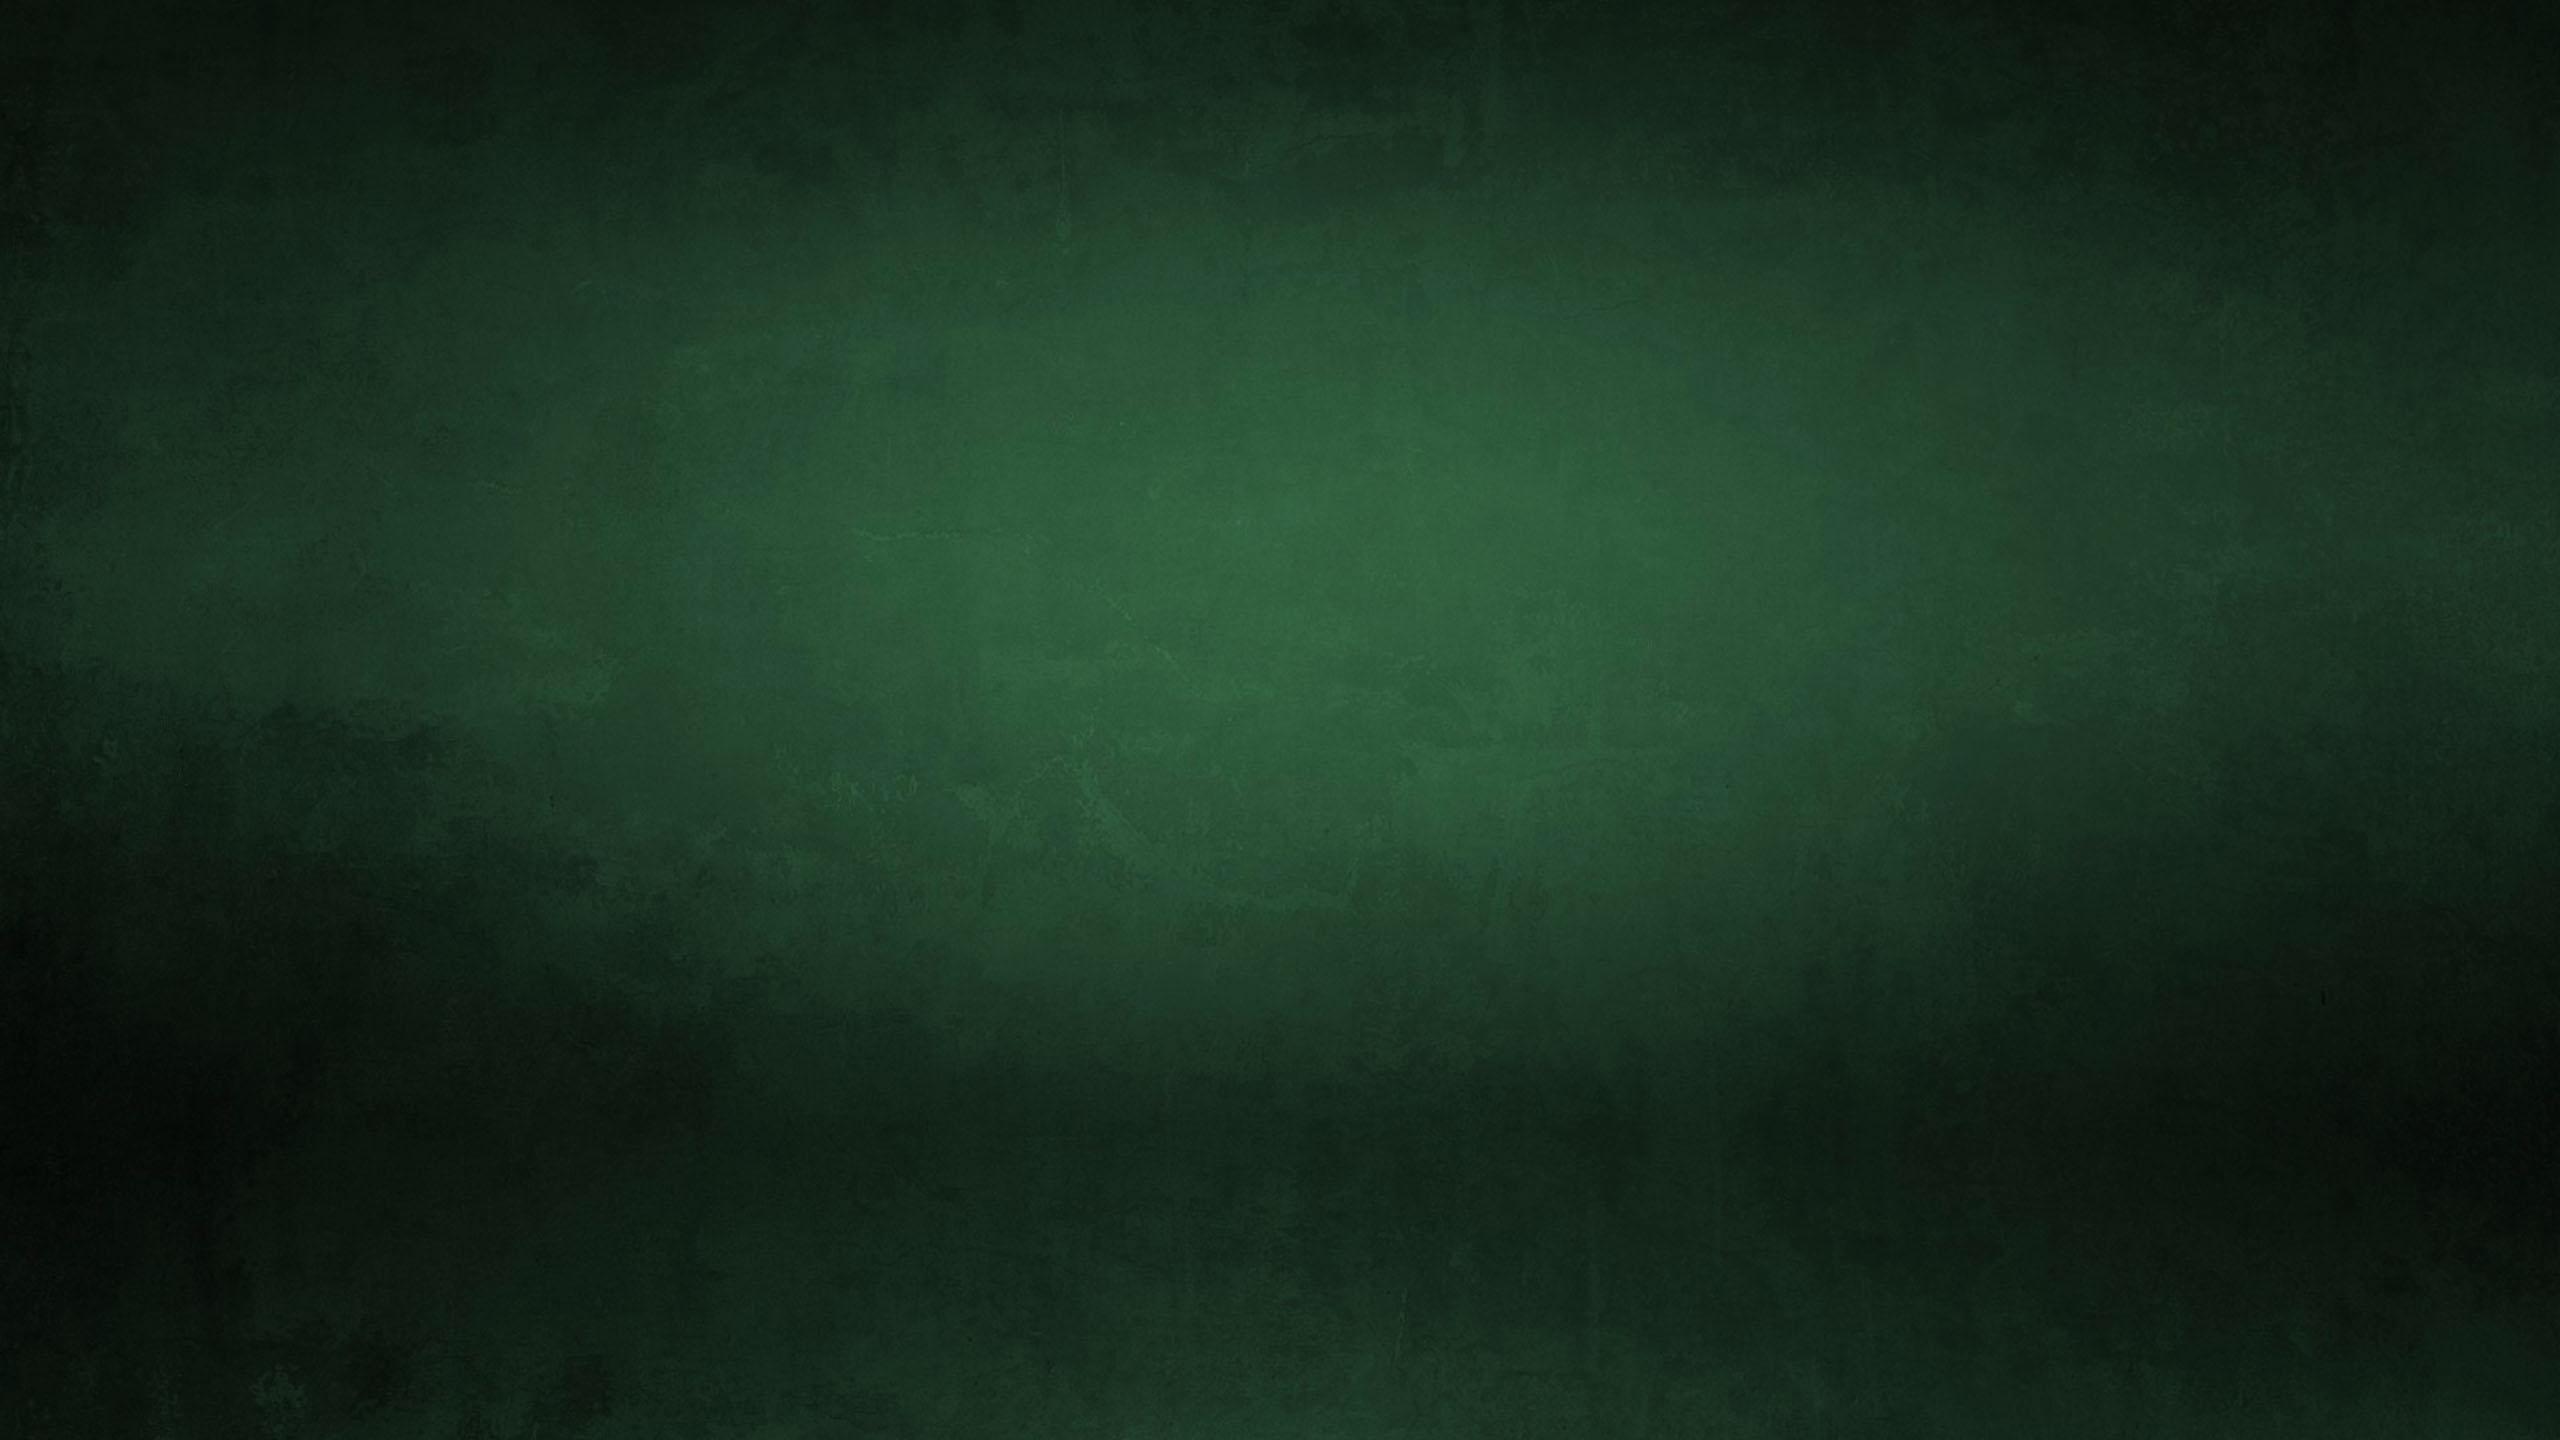 8 hd dark green wallpapers hdwallsourcecom